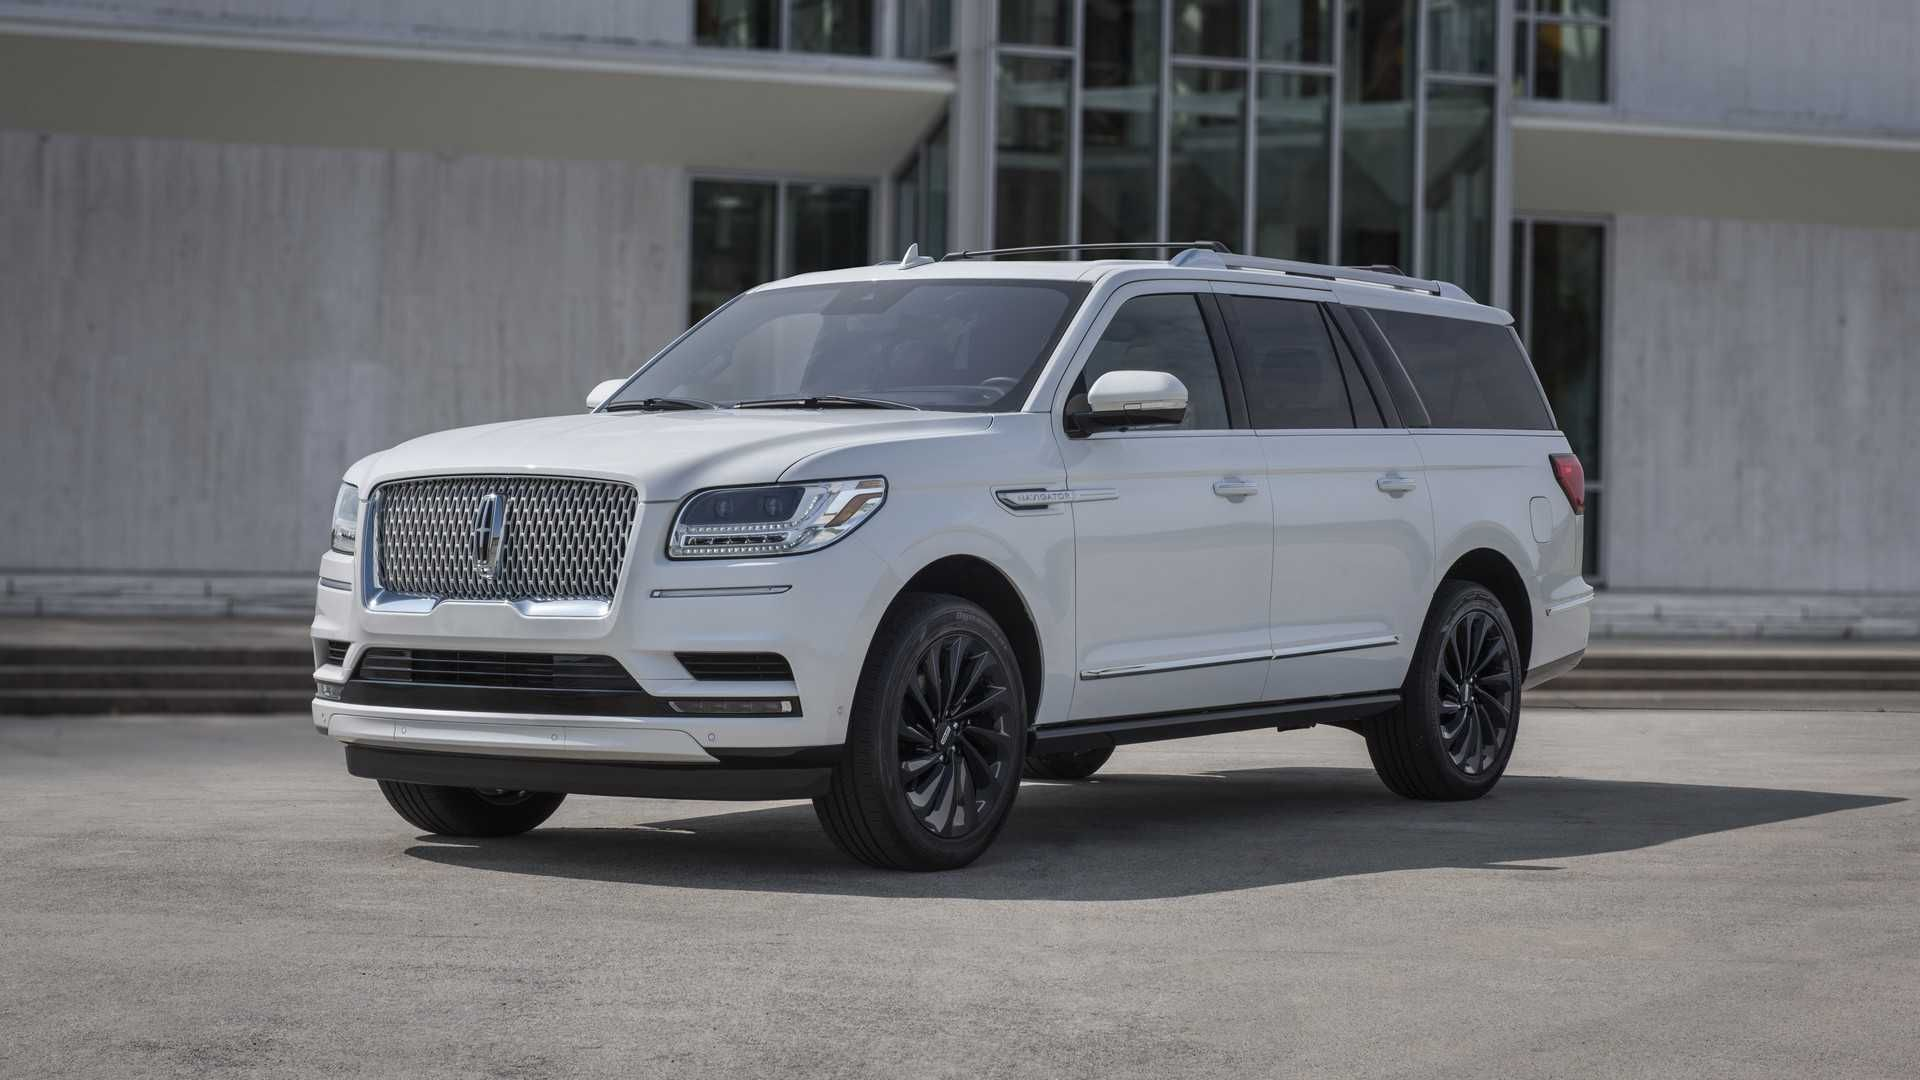 The 2020 Lincoln Navigator luxury SUV brings more standard